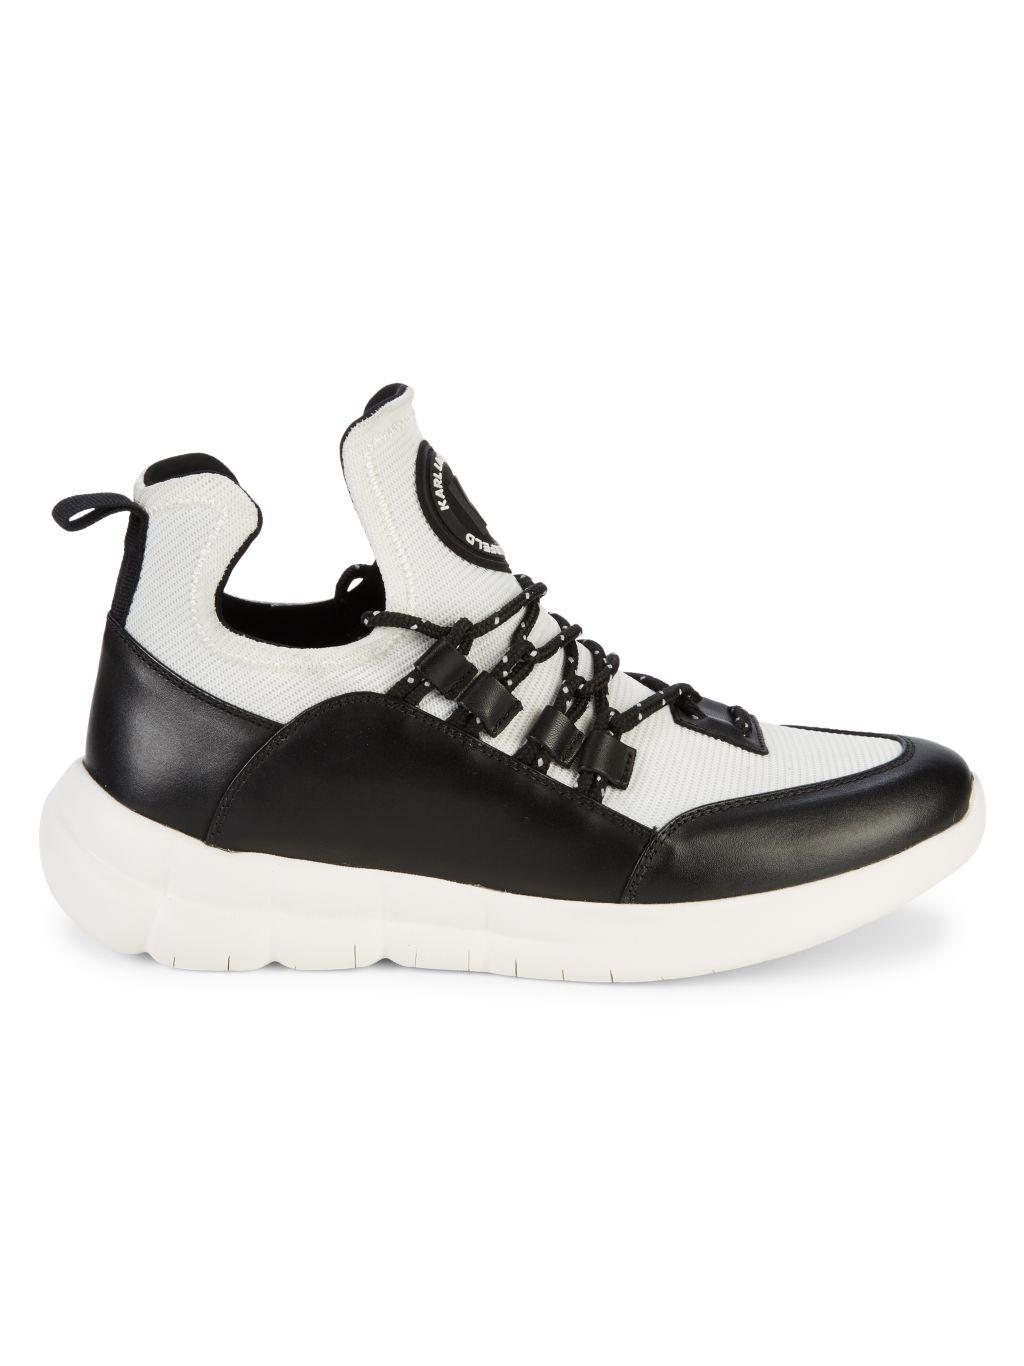 Karl Lagerfeld Paris Colorblock Logo Sneakers